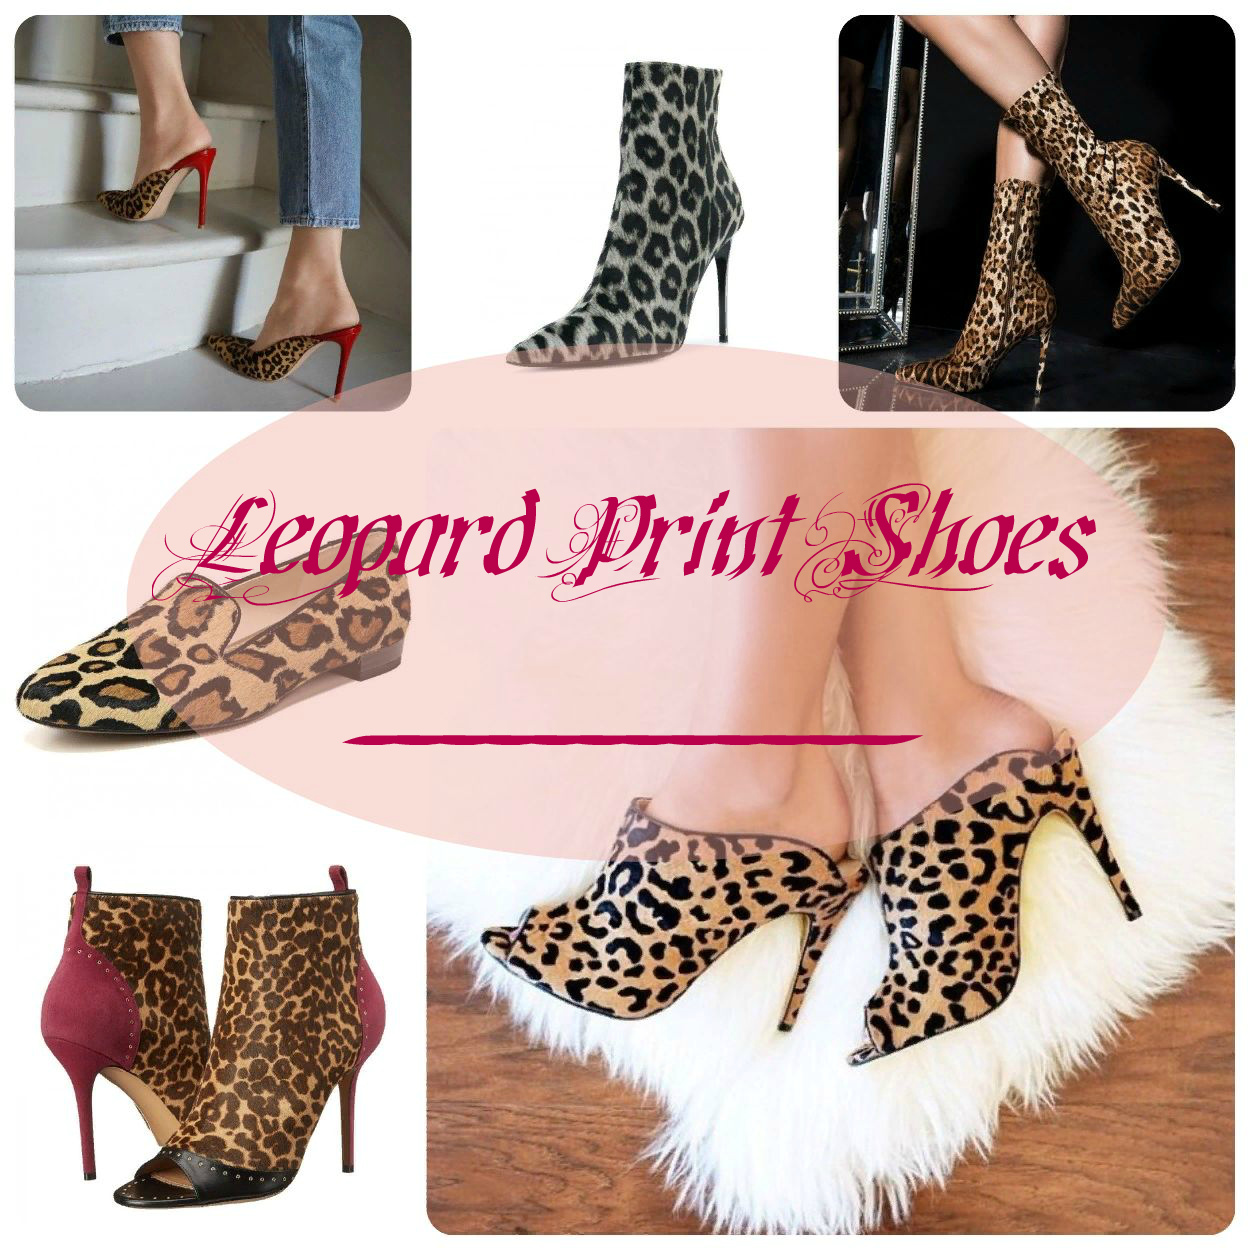 Fsjshoes.com - leopard print shoes